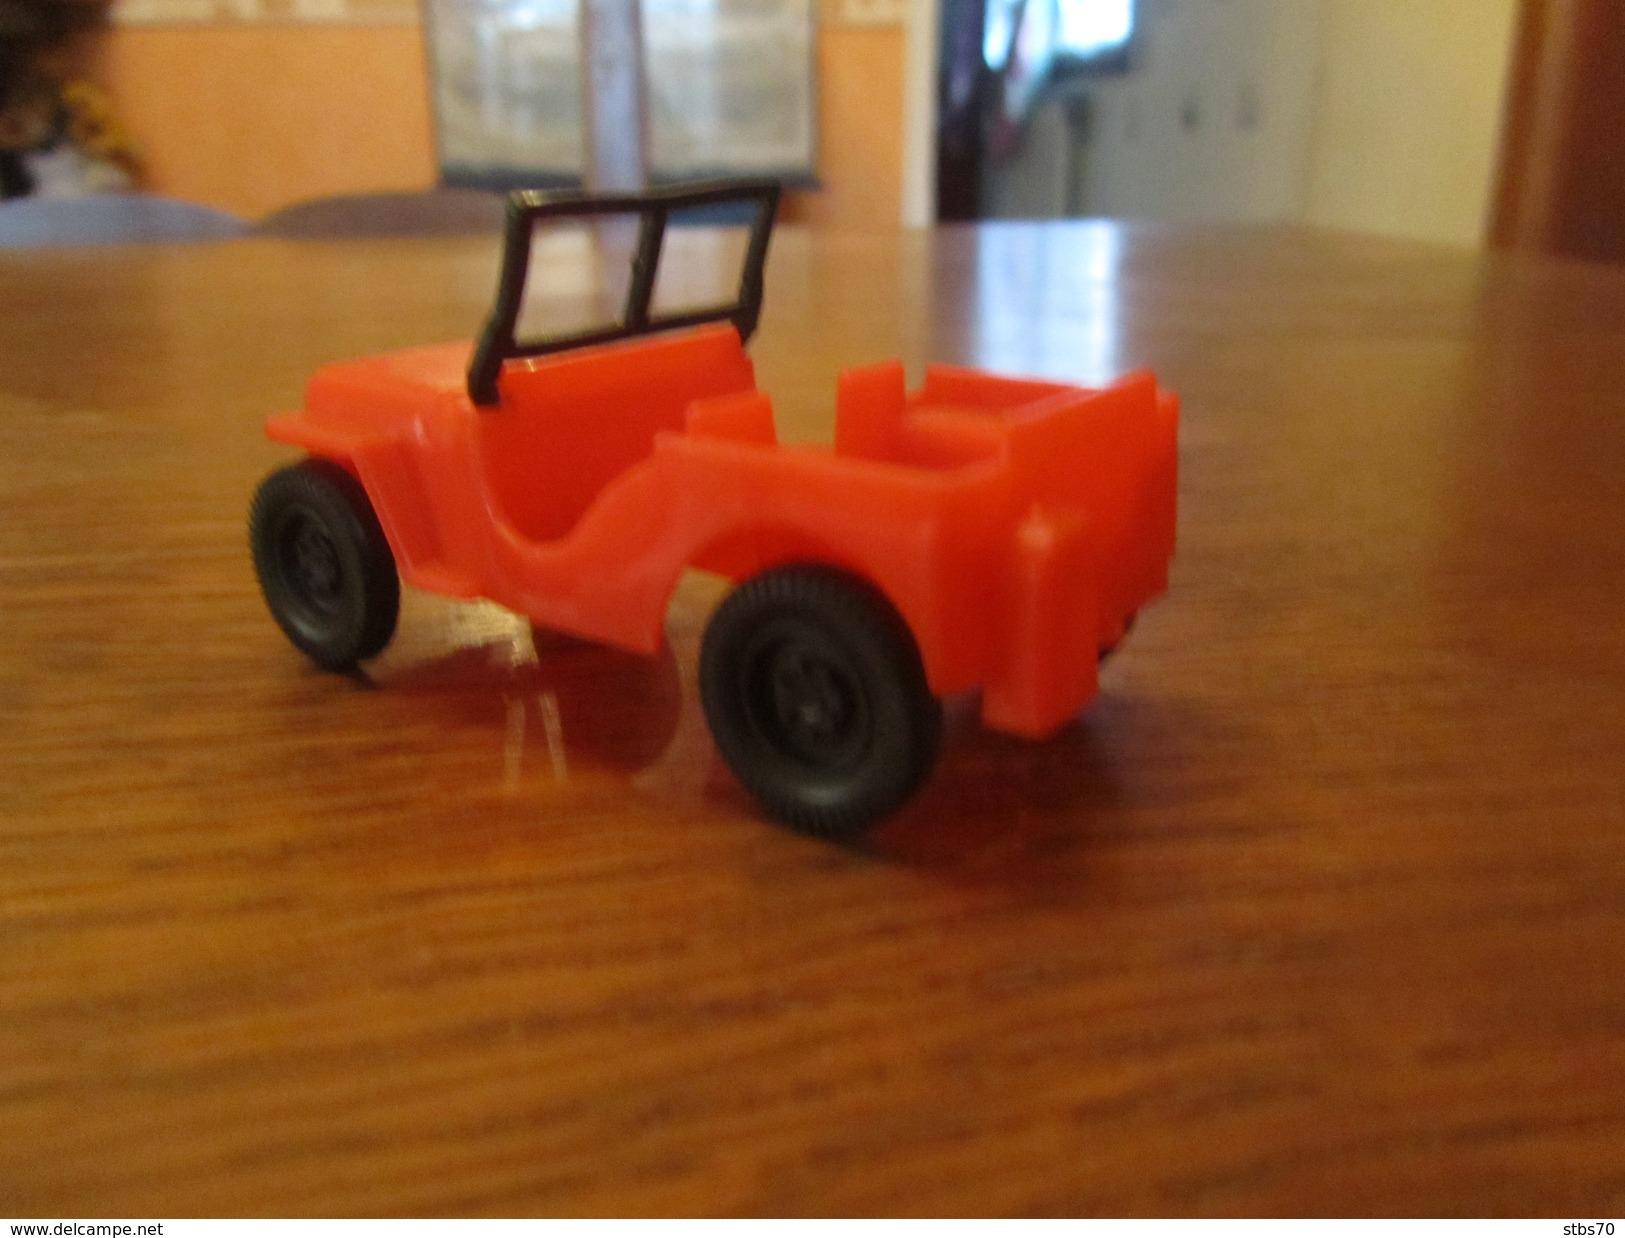 BX14 Jouet De Bazar, Universal Jeep Dulcop Producs, Made In Italy, 7 Cm - Toy Memorabilia